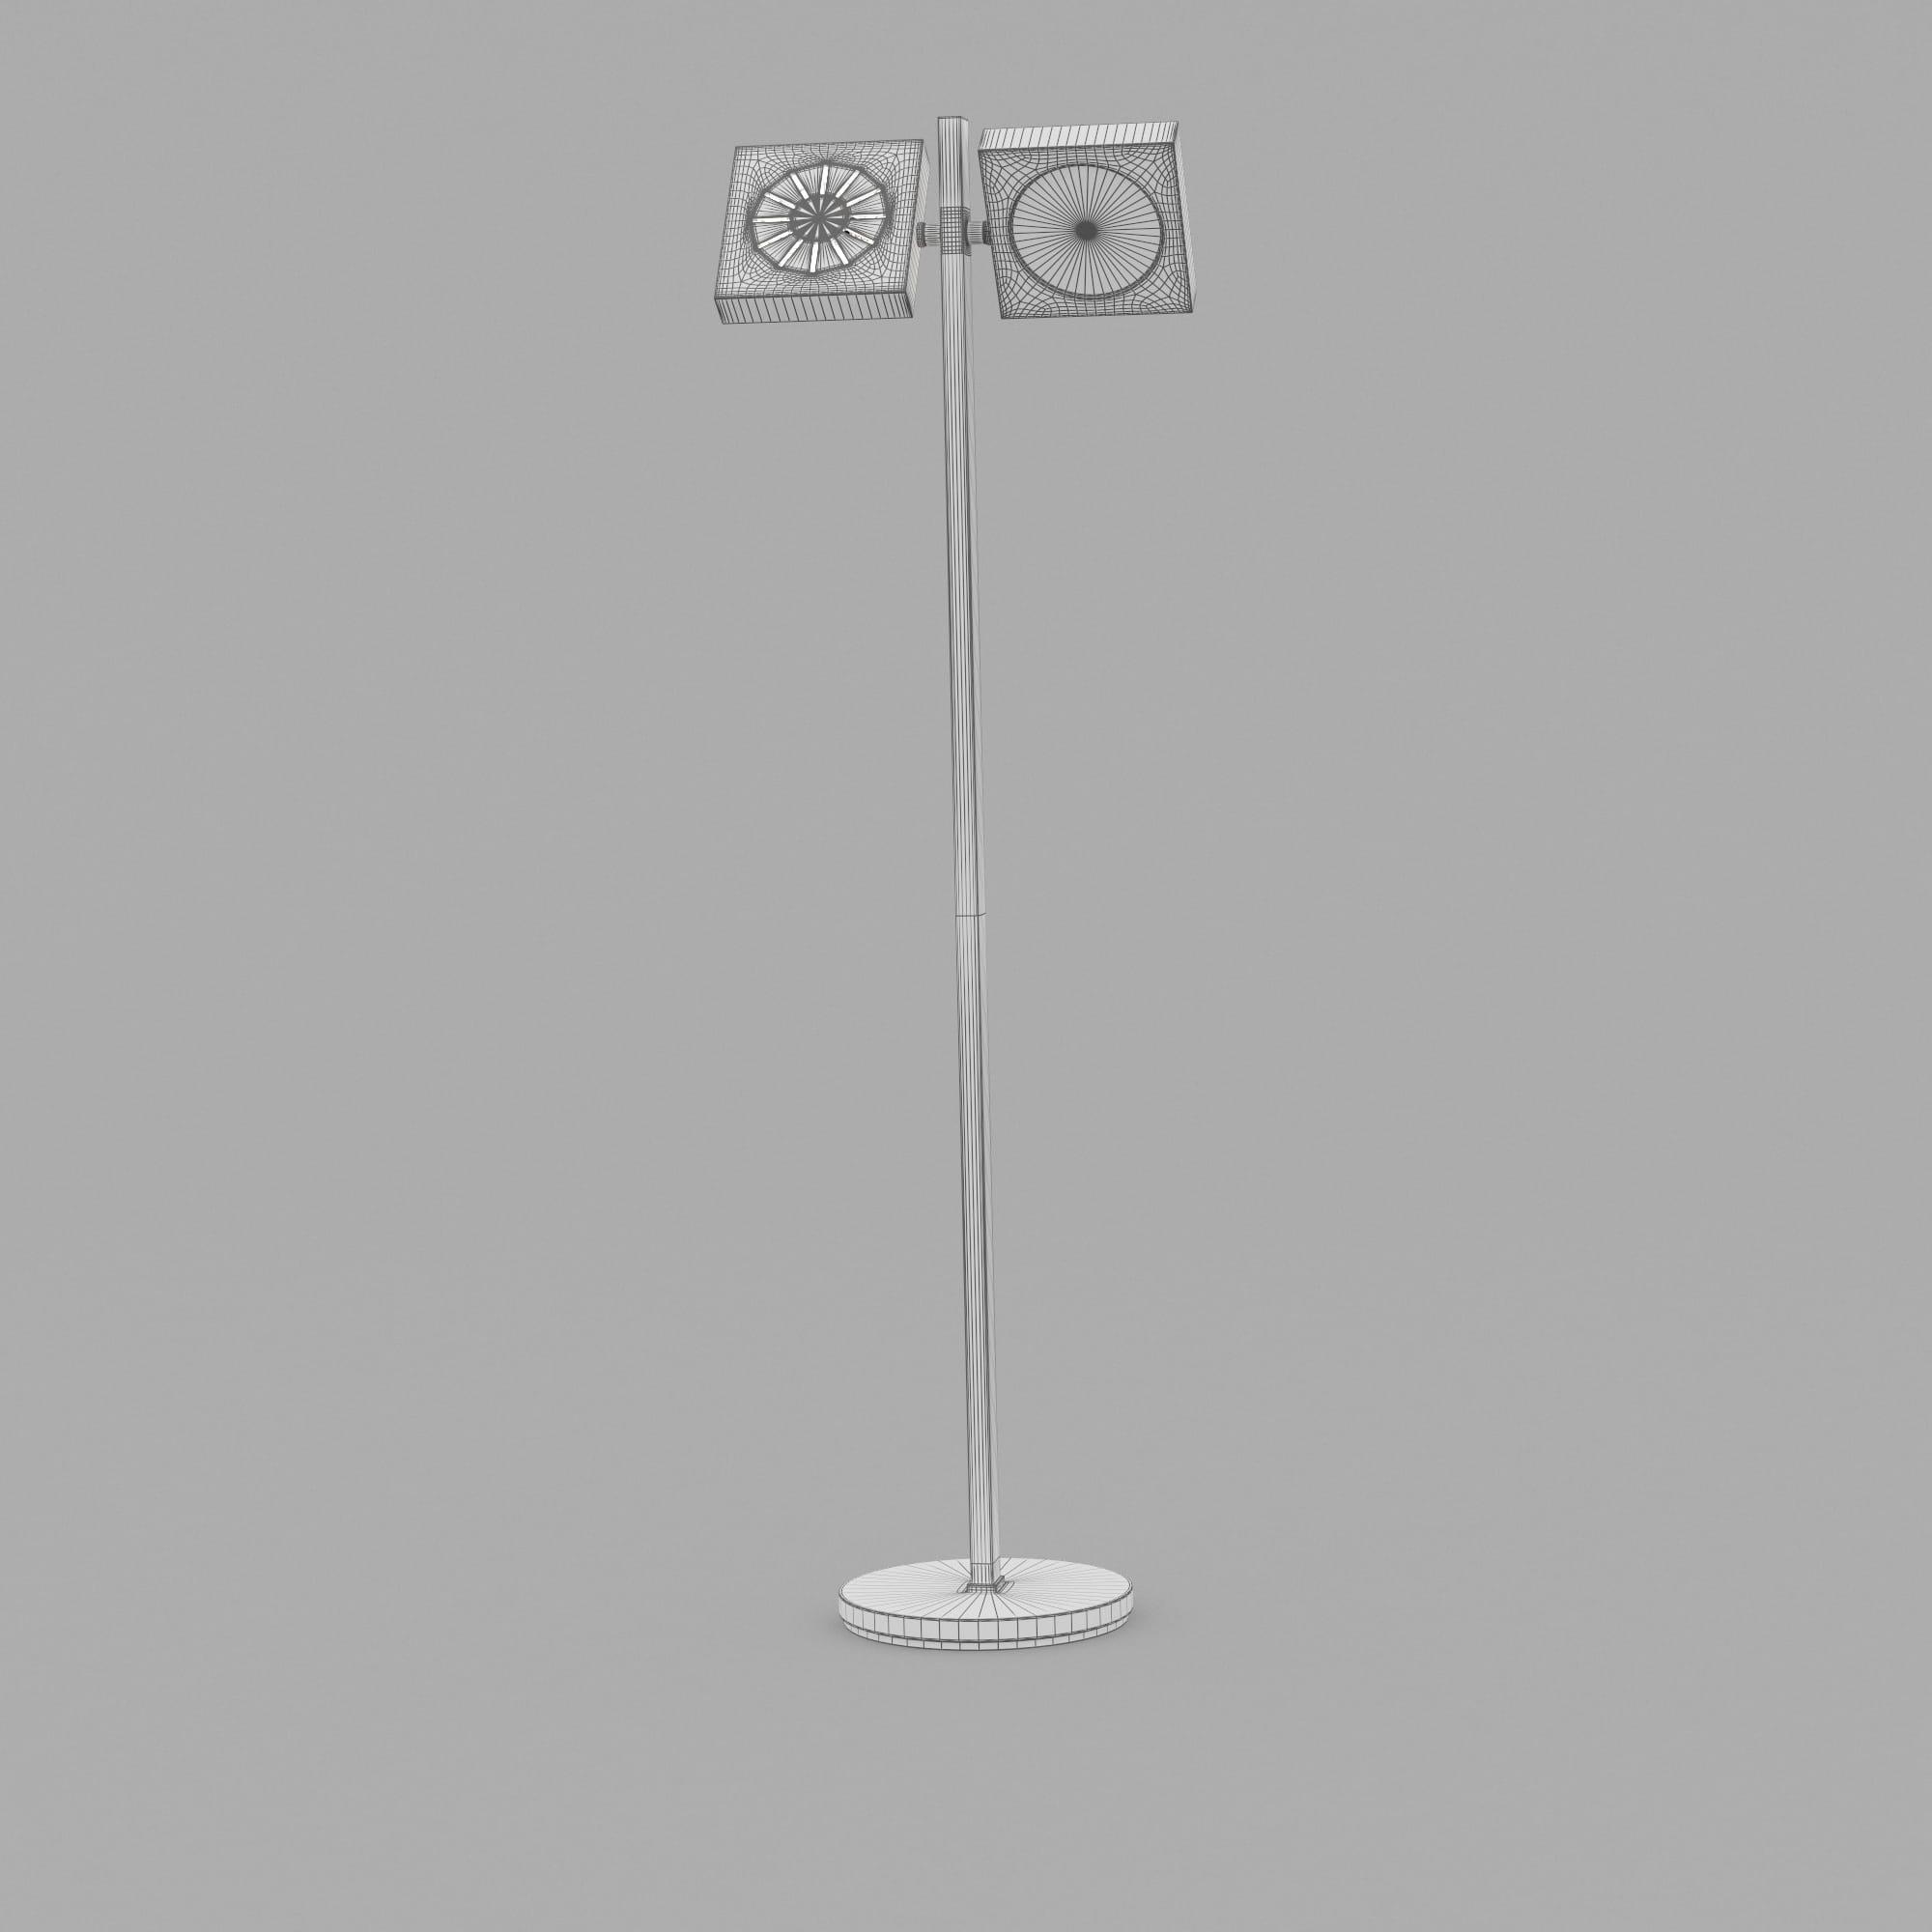 lamp 10 AM247